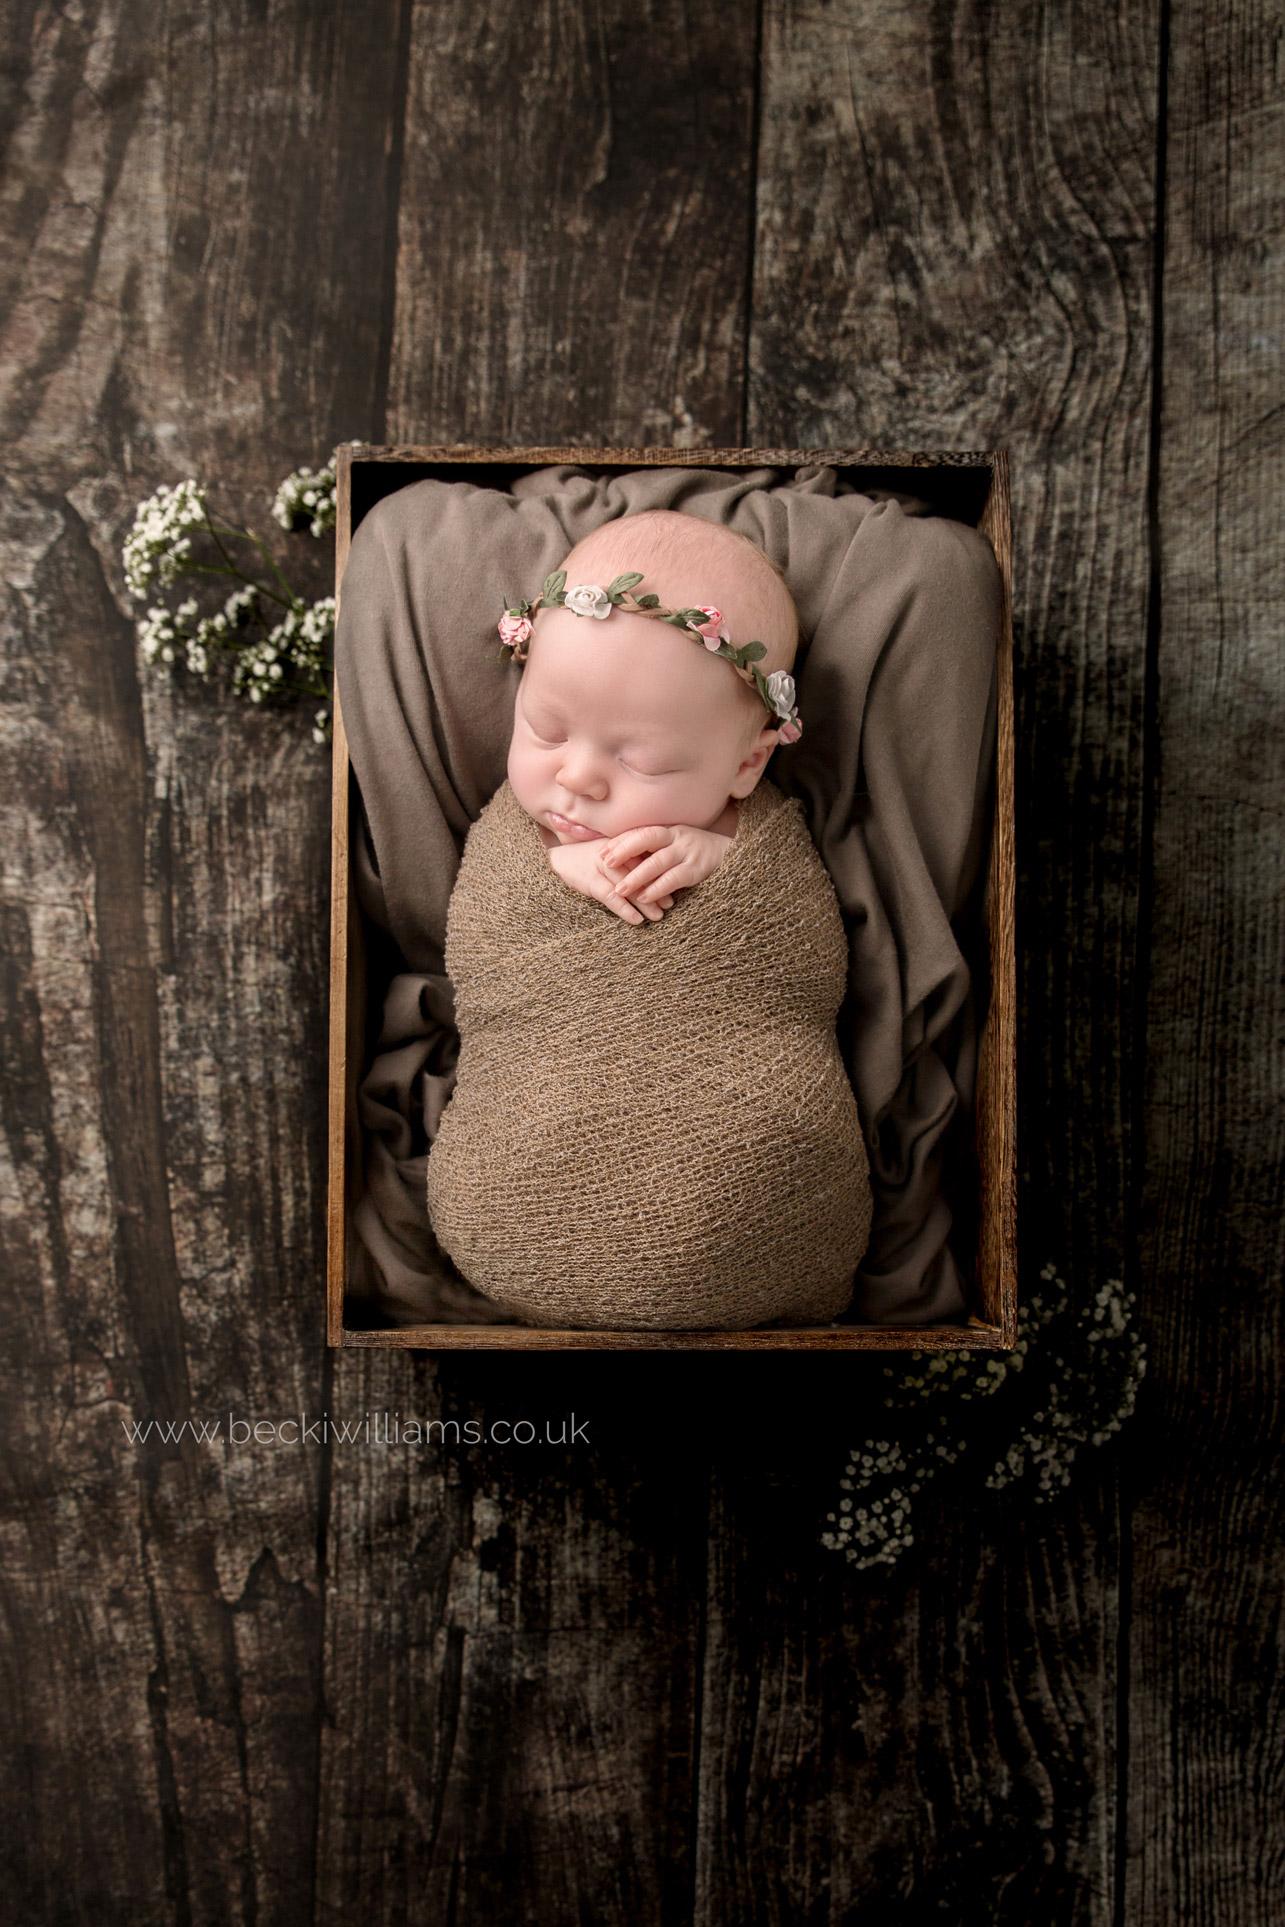 newborn-photography-hemel-hempstead-flowers-becki-williams-photography.jpg